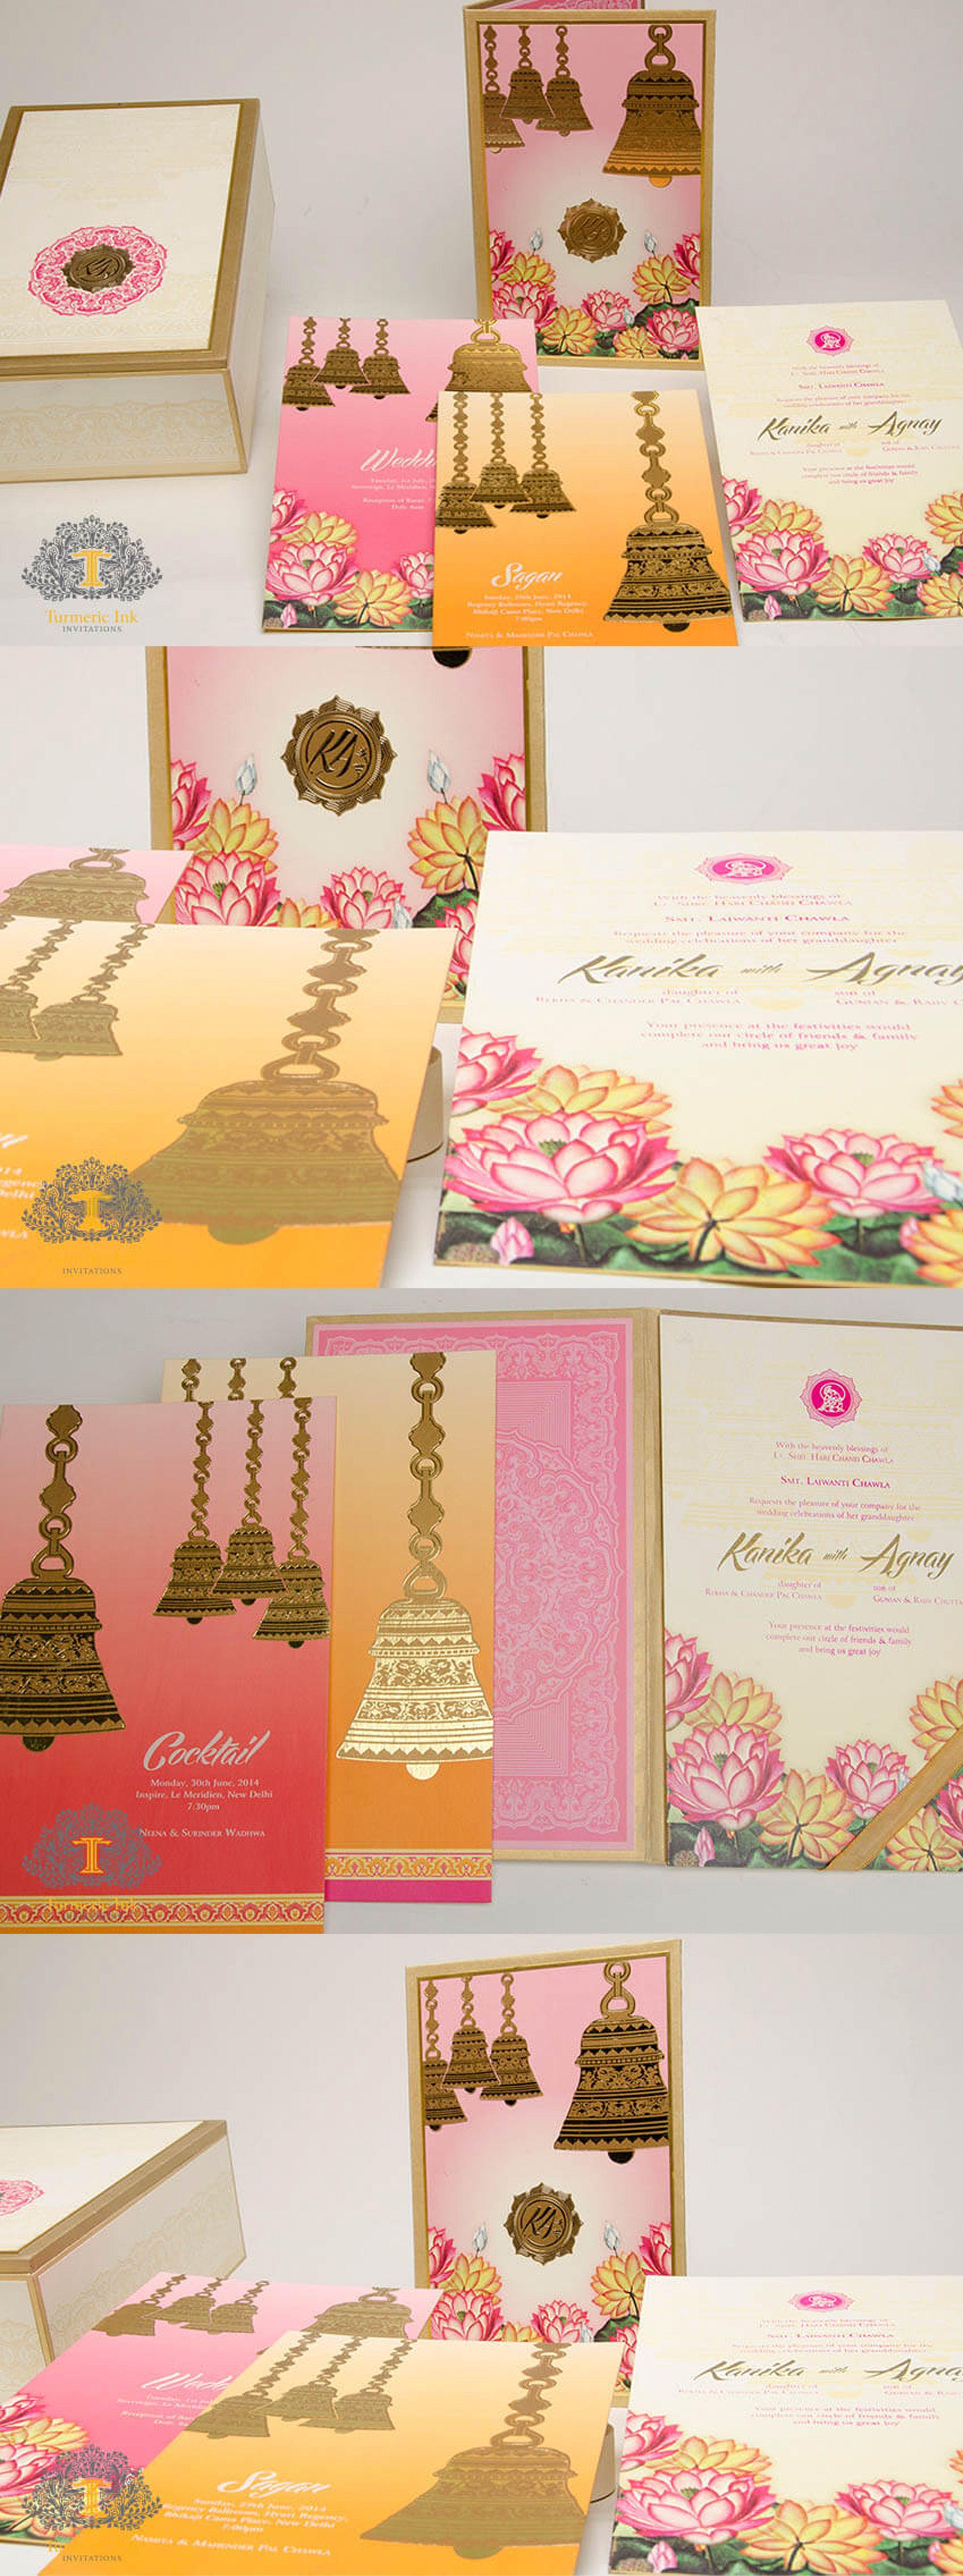 muslim wedding invitations mumbai%0A Amazing Royal Elephant theme khaki wedding invitation card  Now available  on www regalcards com   Pinterest   Elephant theme  Wedding invitation cards  and